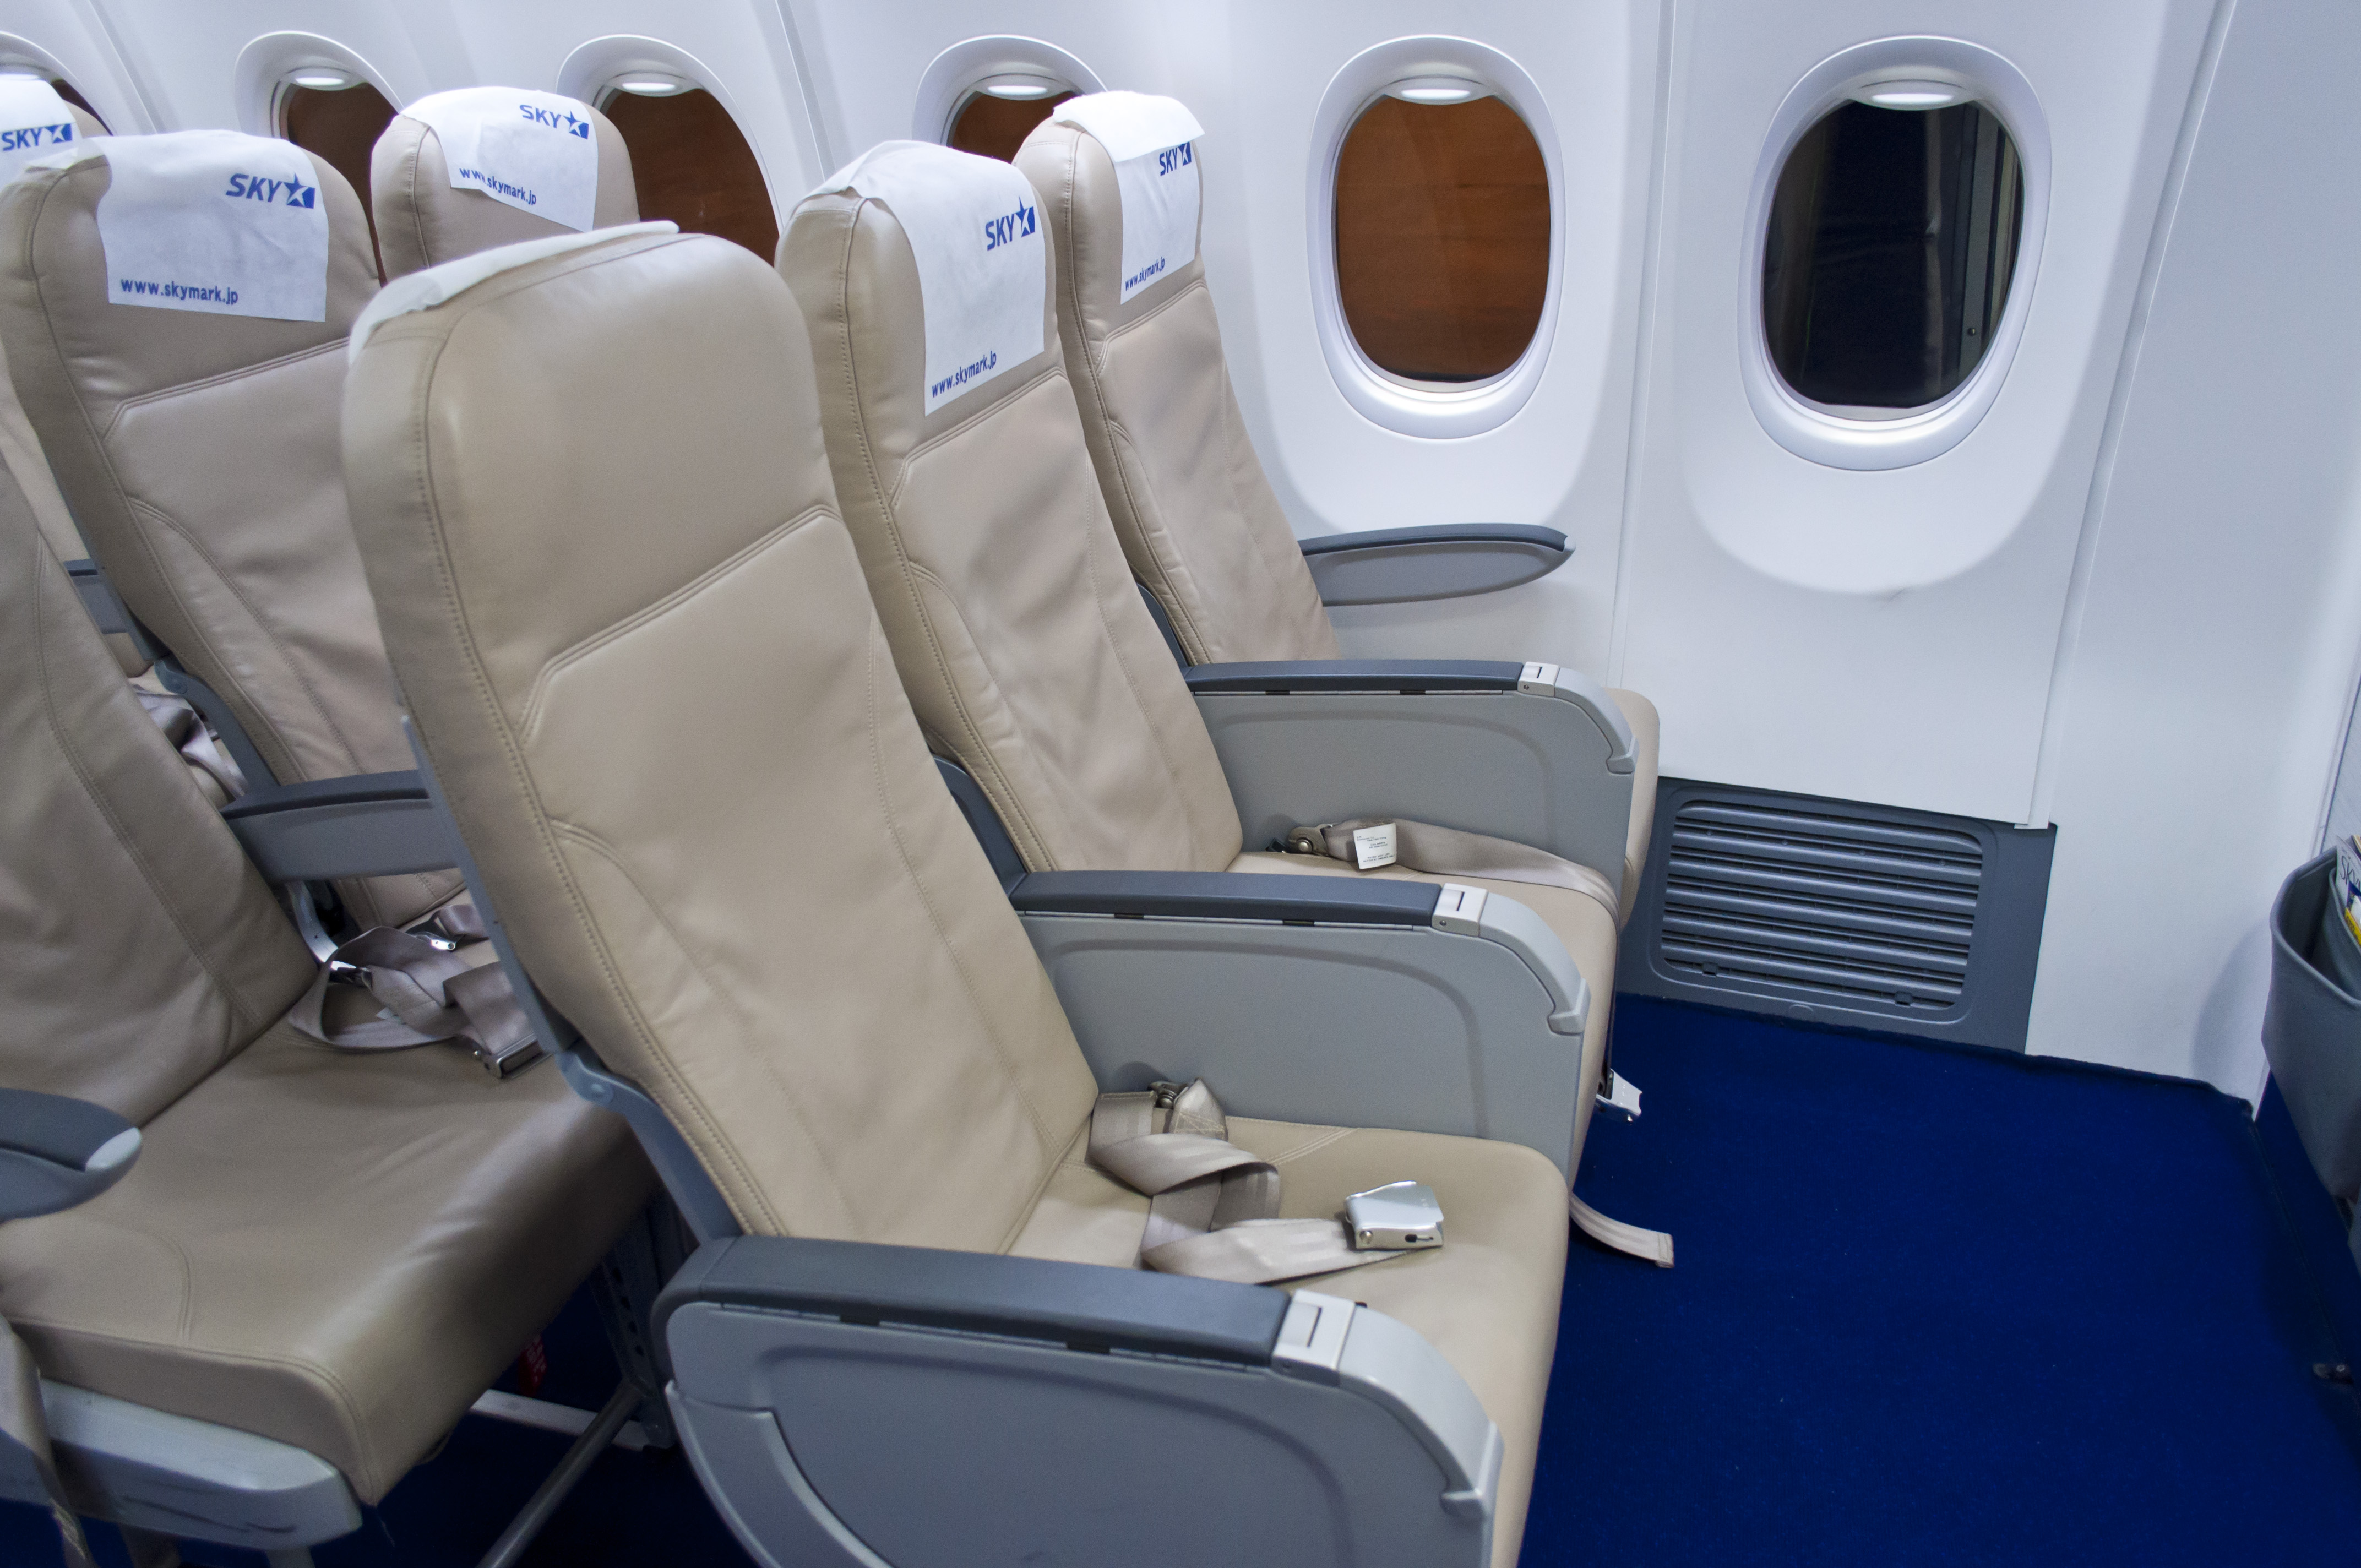 File:SKYMARK 737 SEAT Boeing Sky Interior